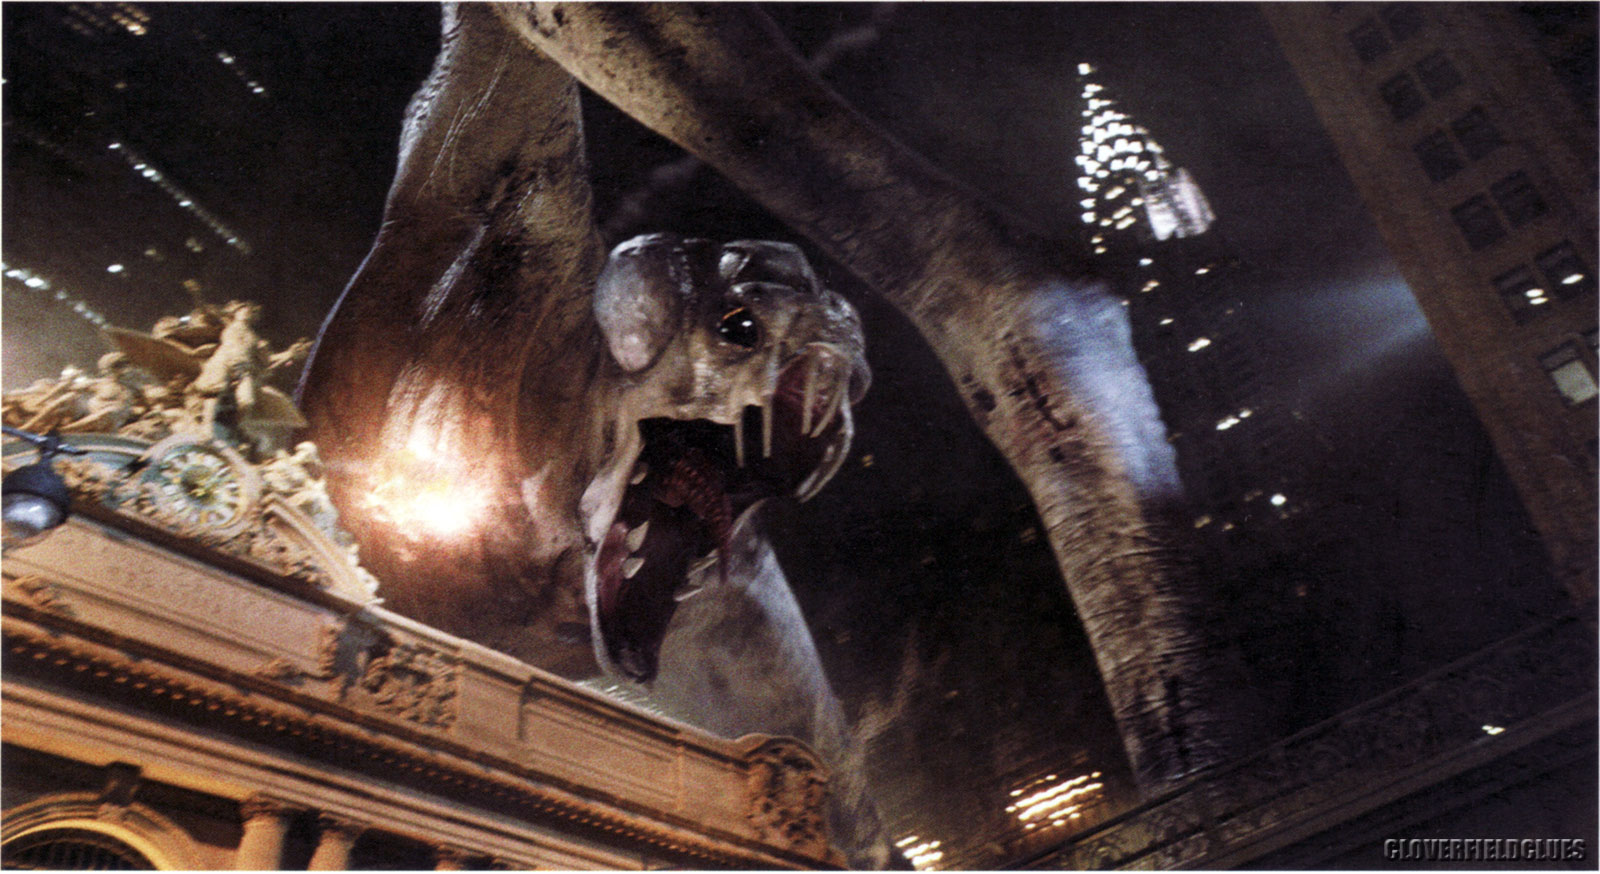 'Cloverfield' Sequel Set at J.J. Abrams' Bad Robot, Paramount